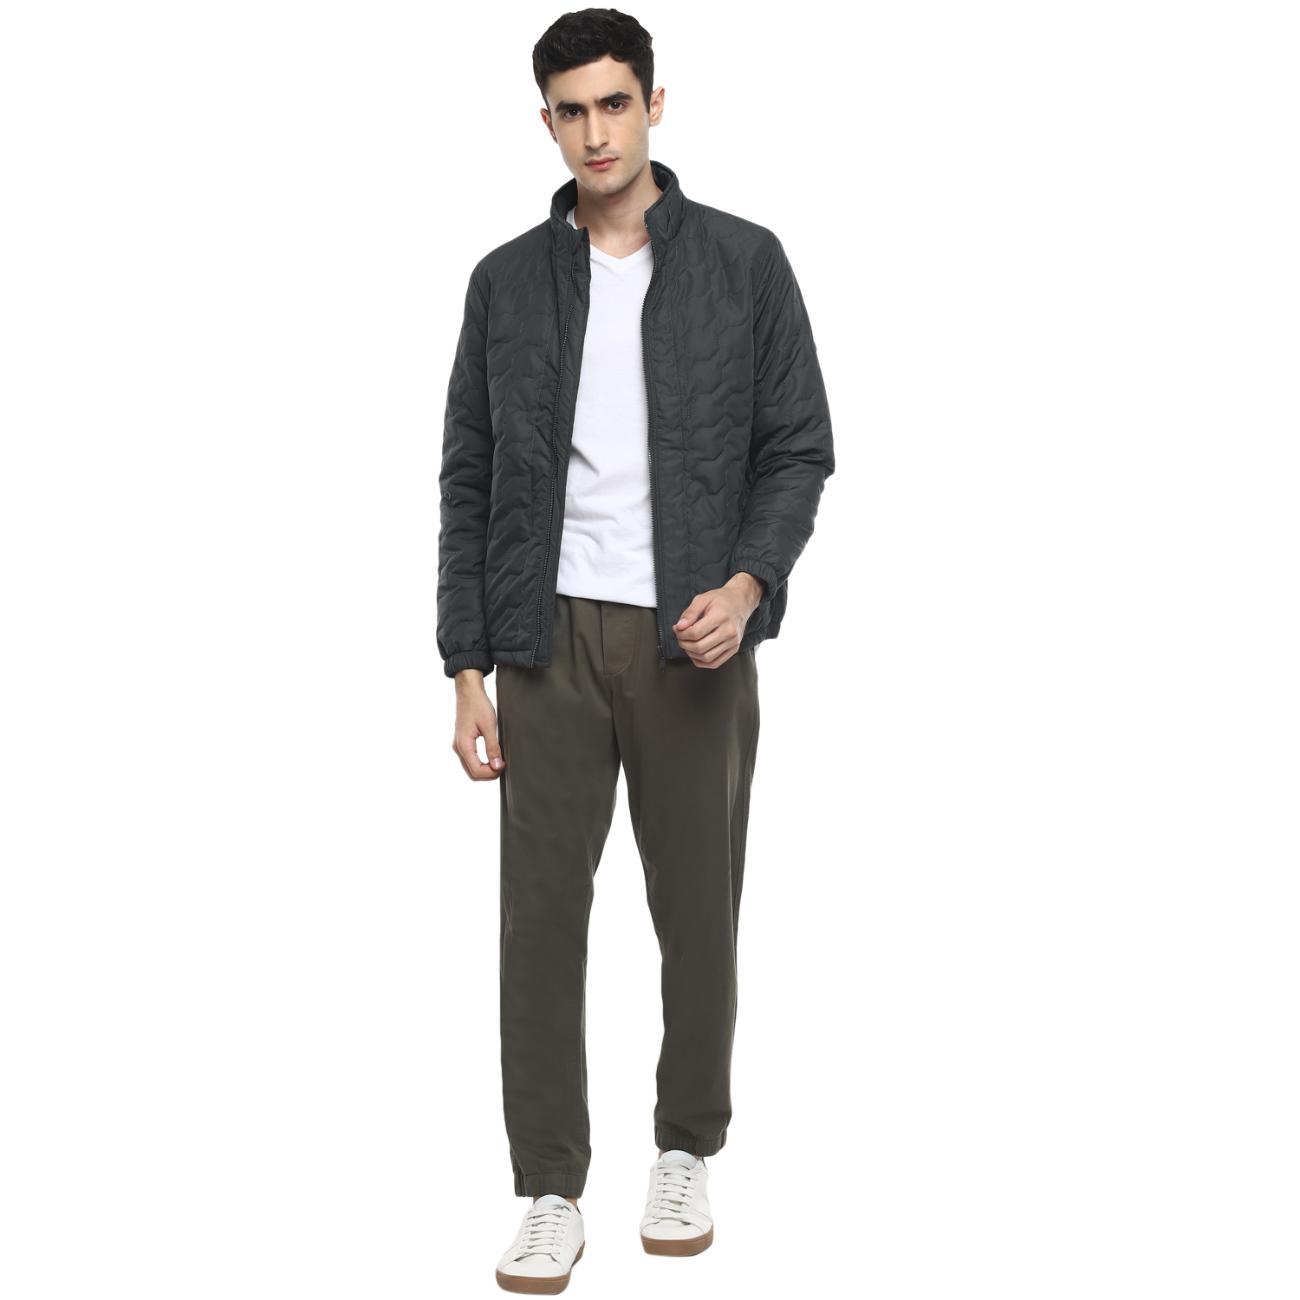 Men's Grey Jacket Online at Red Chief